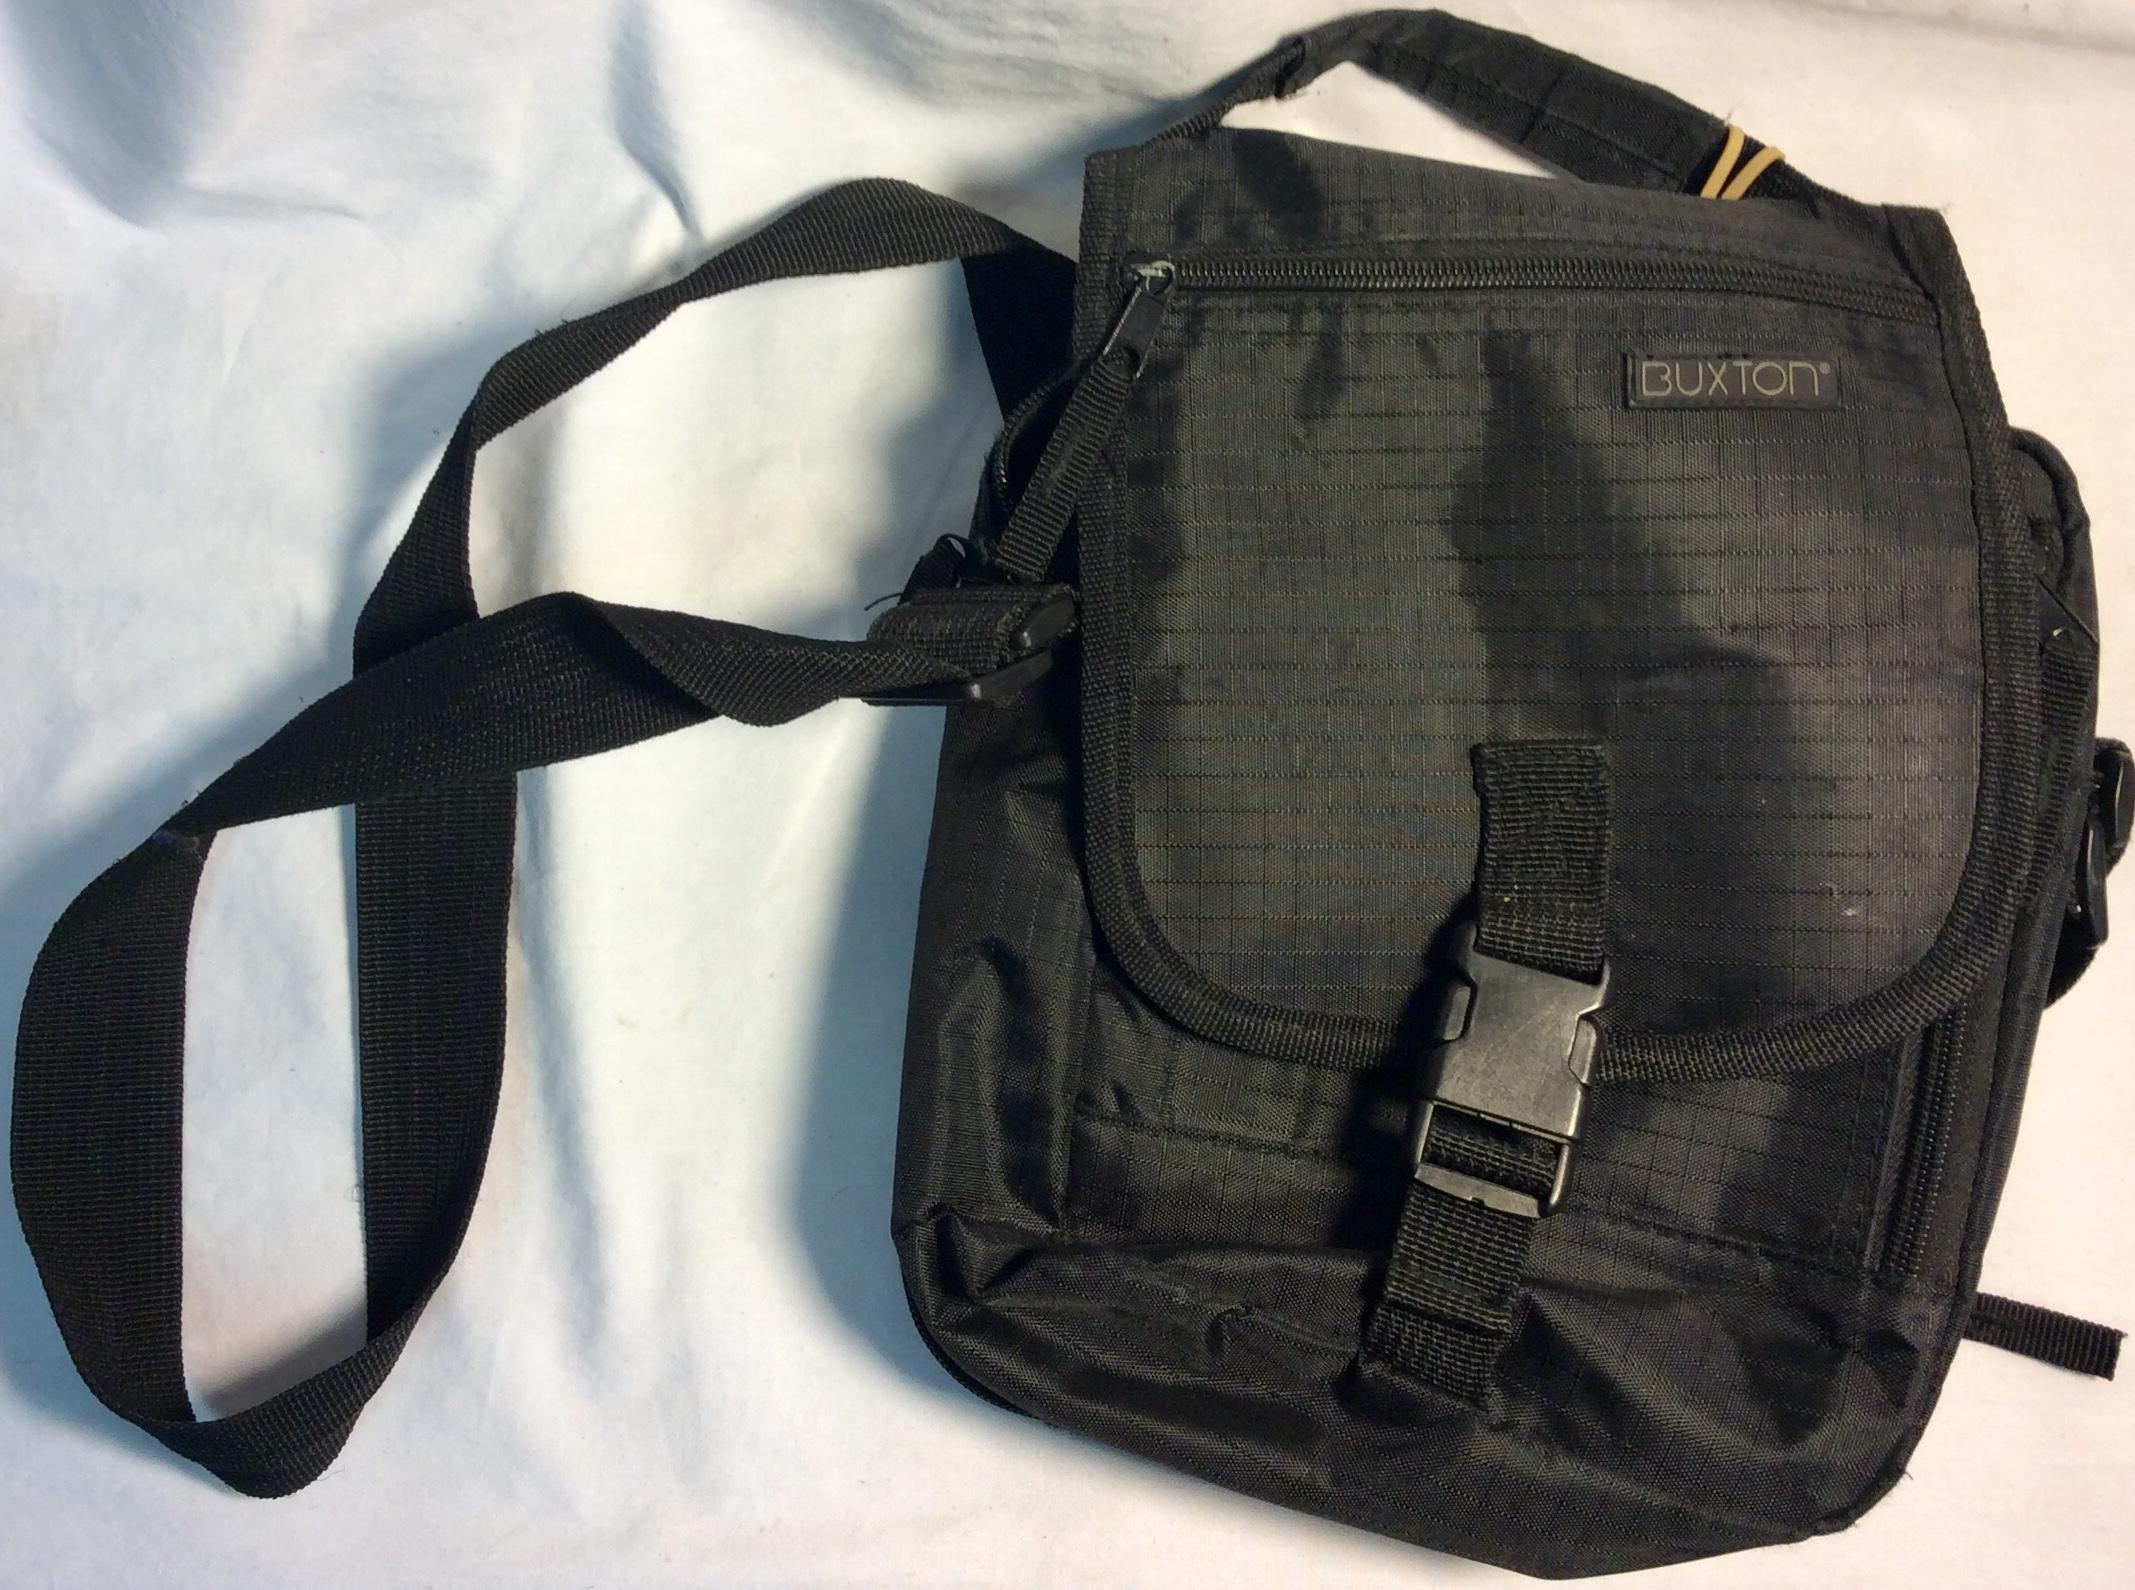 Buxton Black nylon small shoulder bag